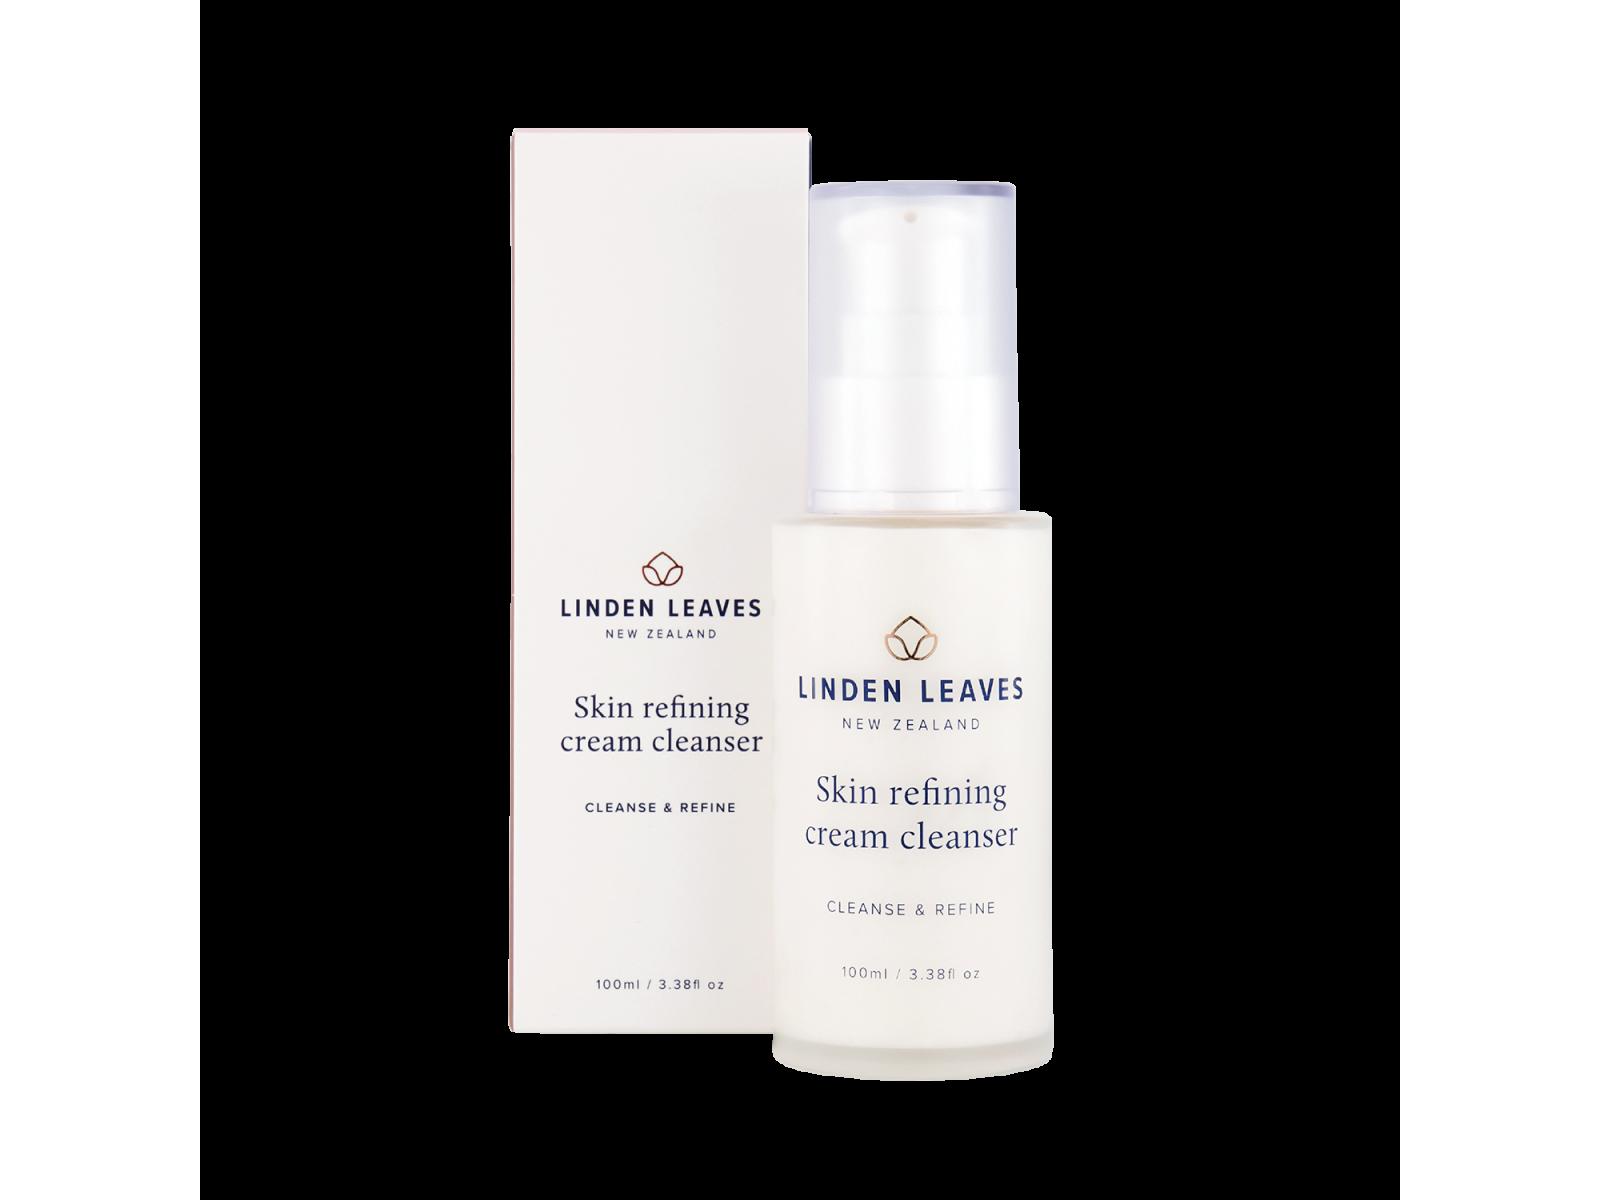 Skin refining cream cleanser